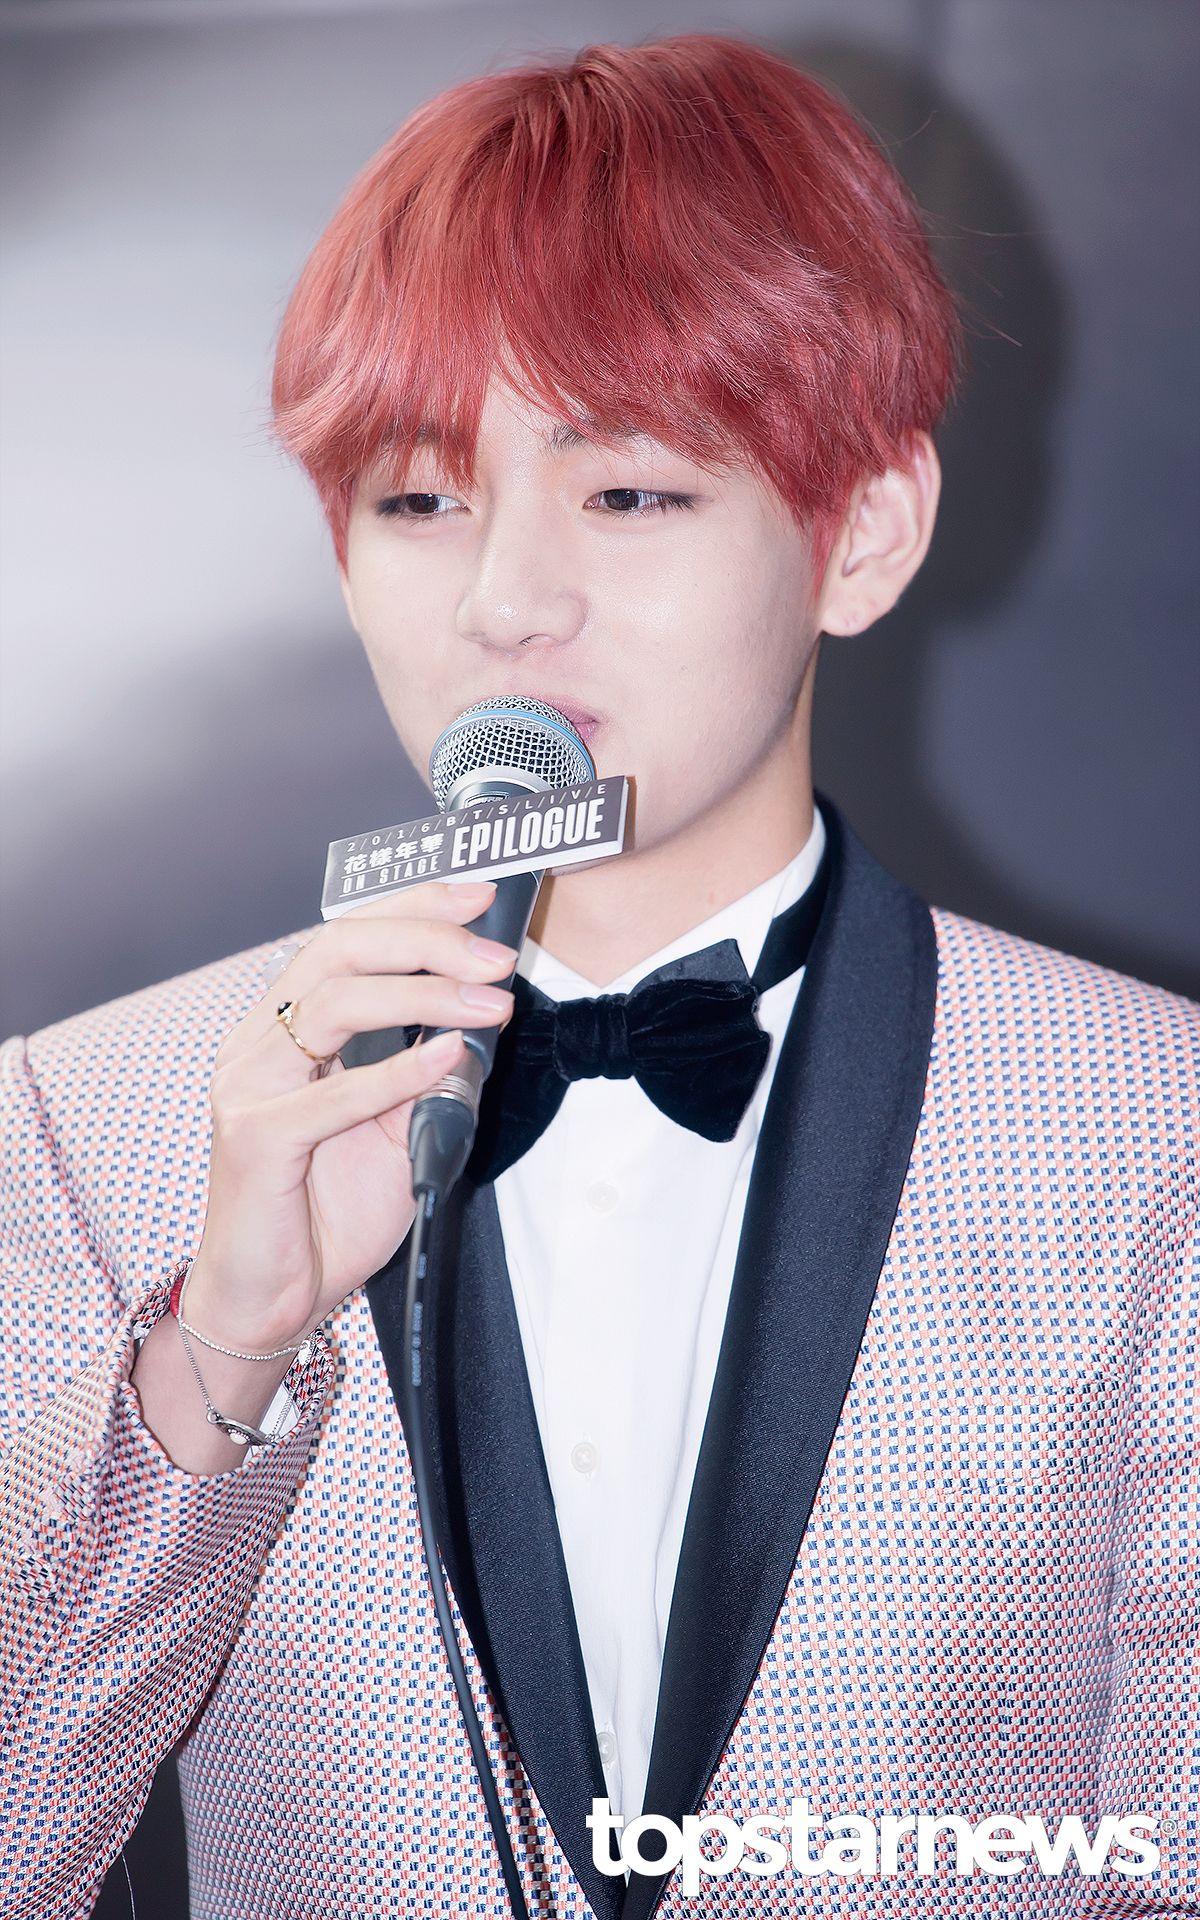 Boy hair color images taehyung red hair  hair color of bts  pinterest  bts bts bangtan